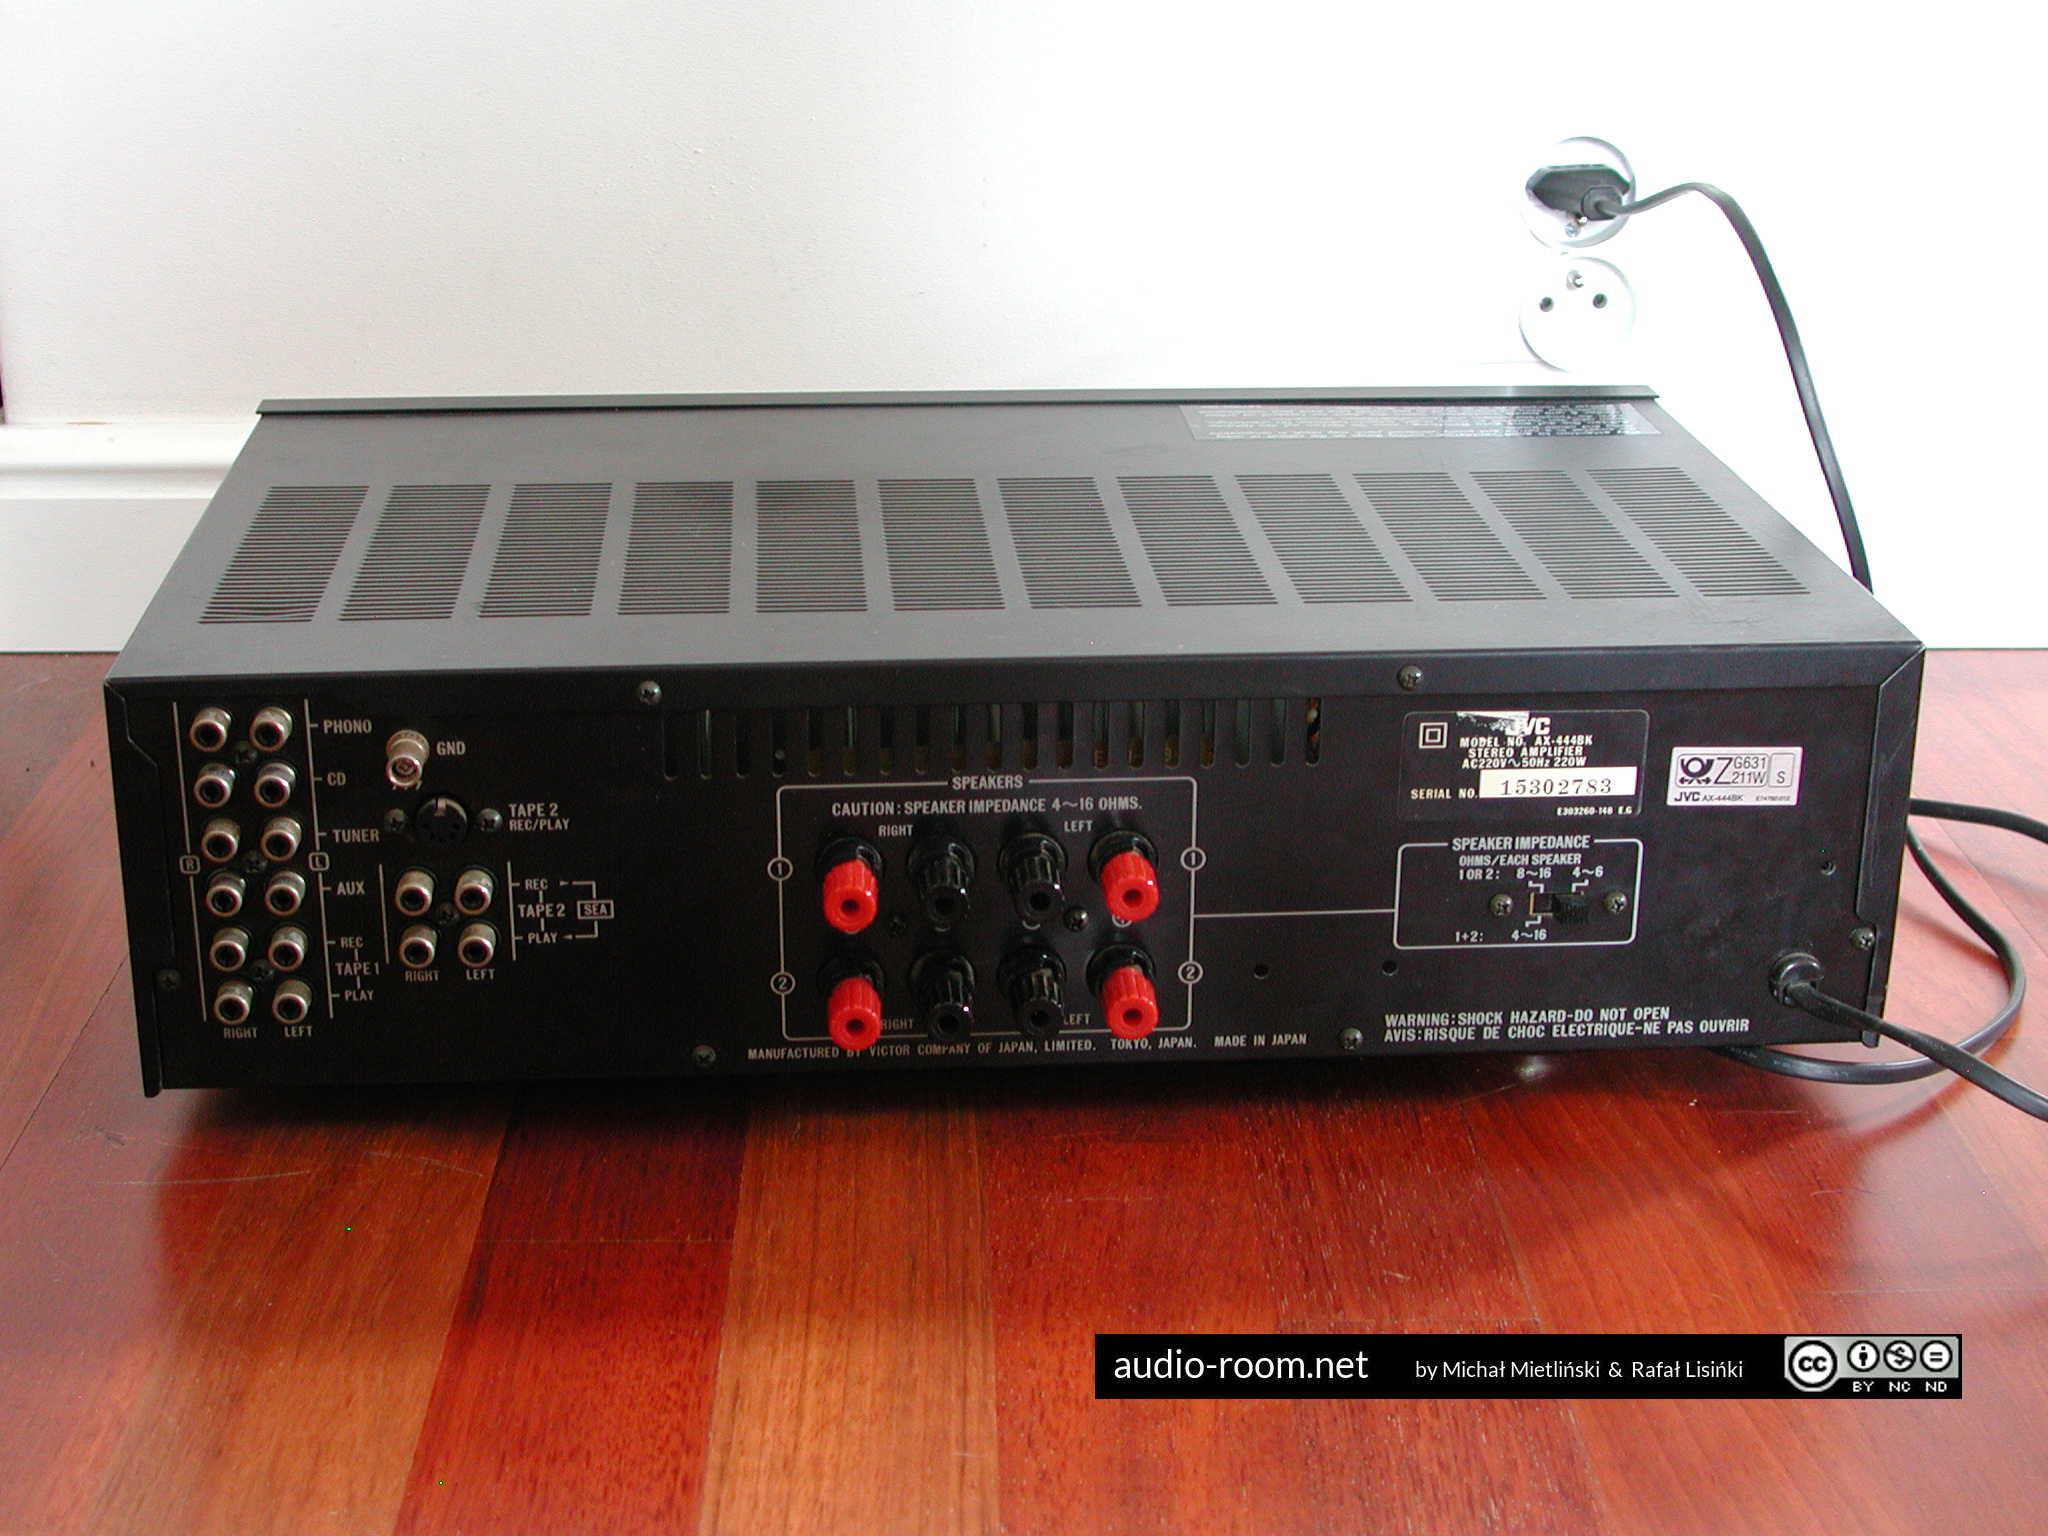 jvc-ax-444-dscn9512